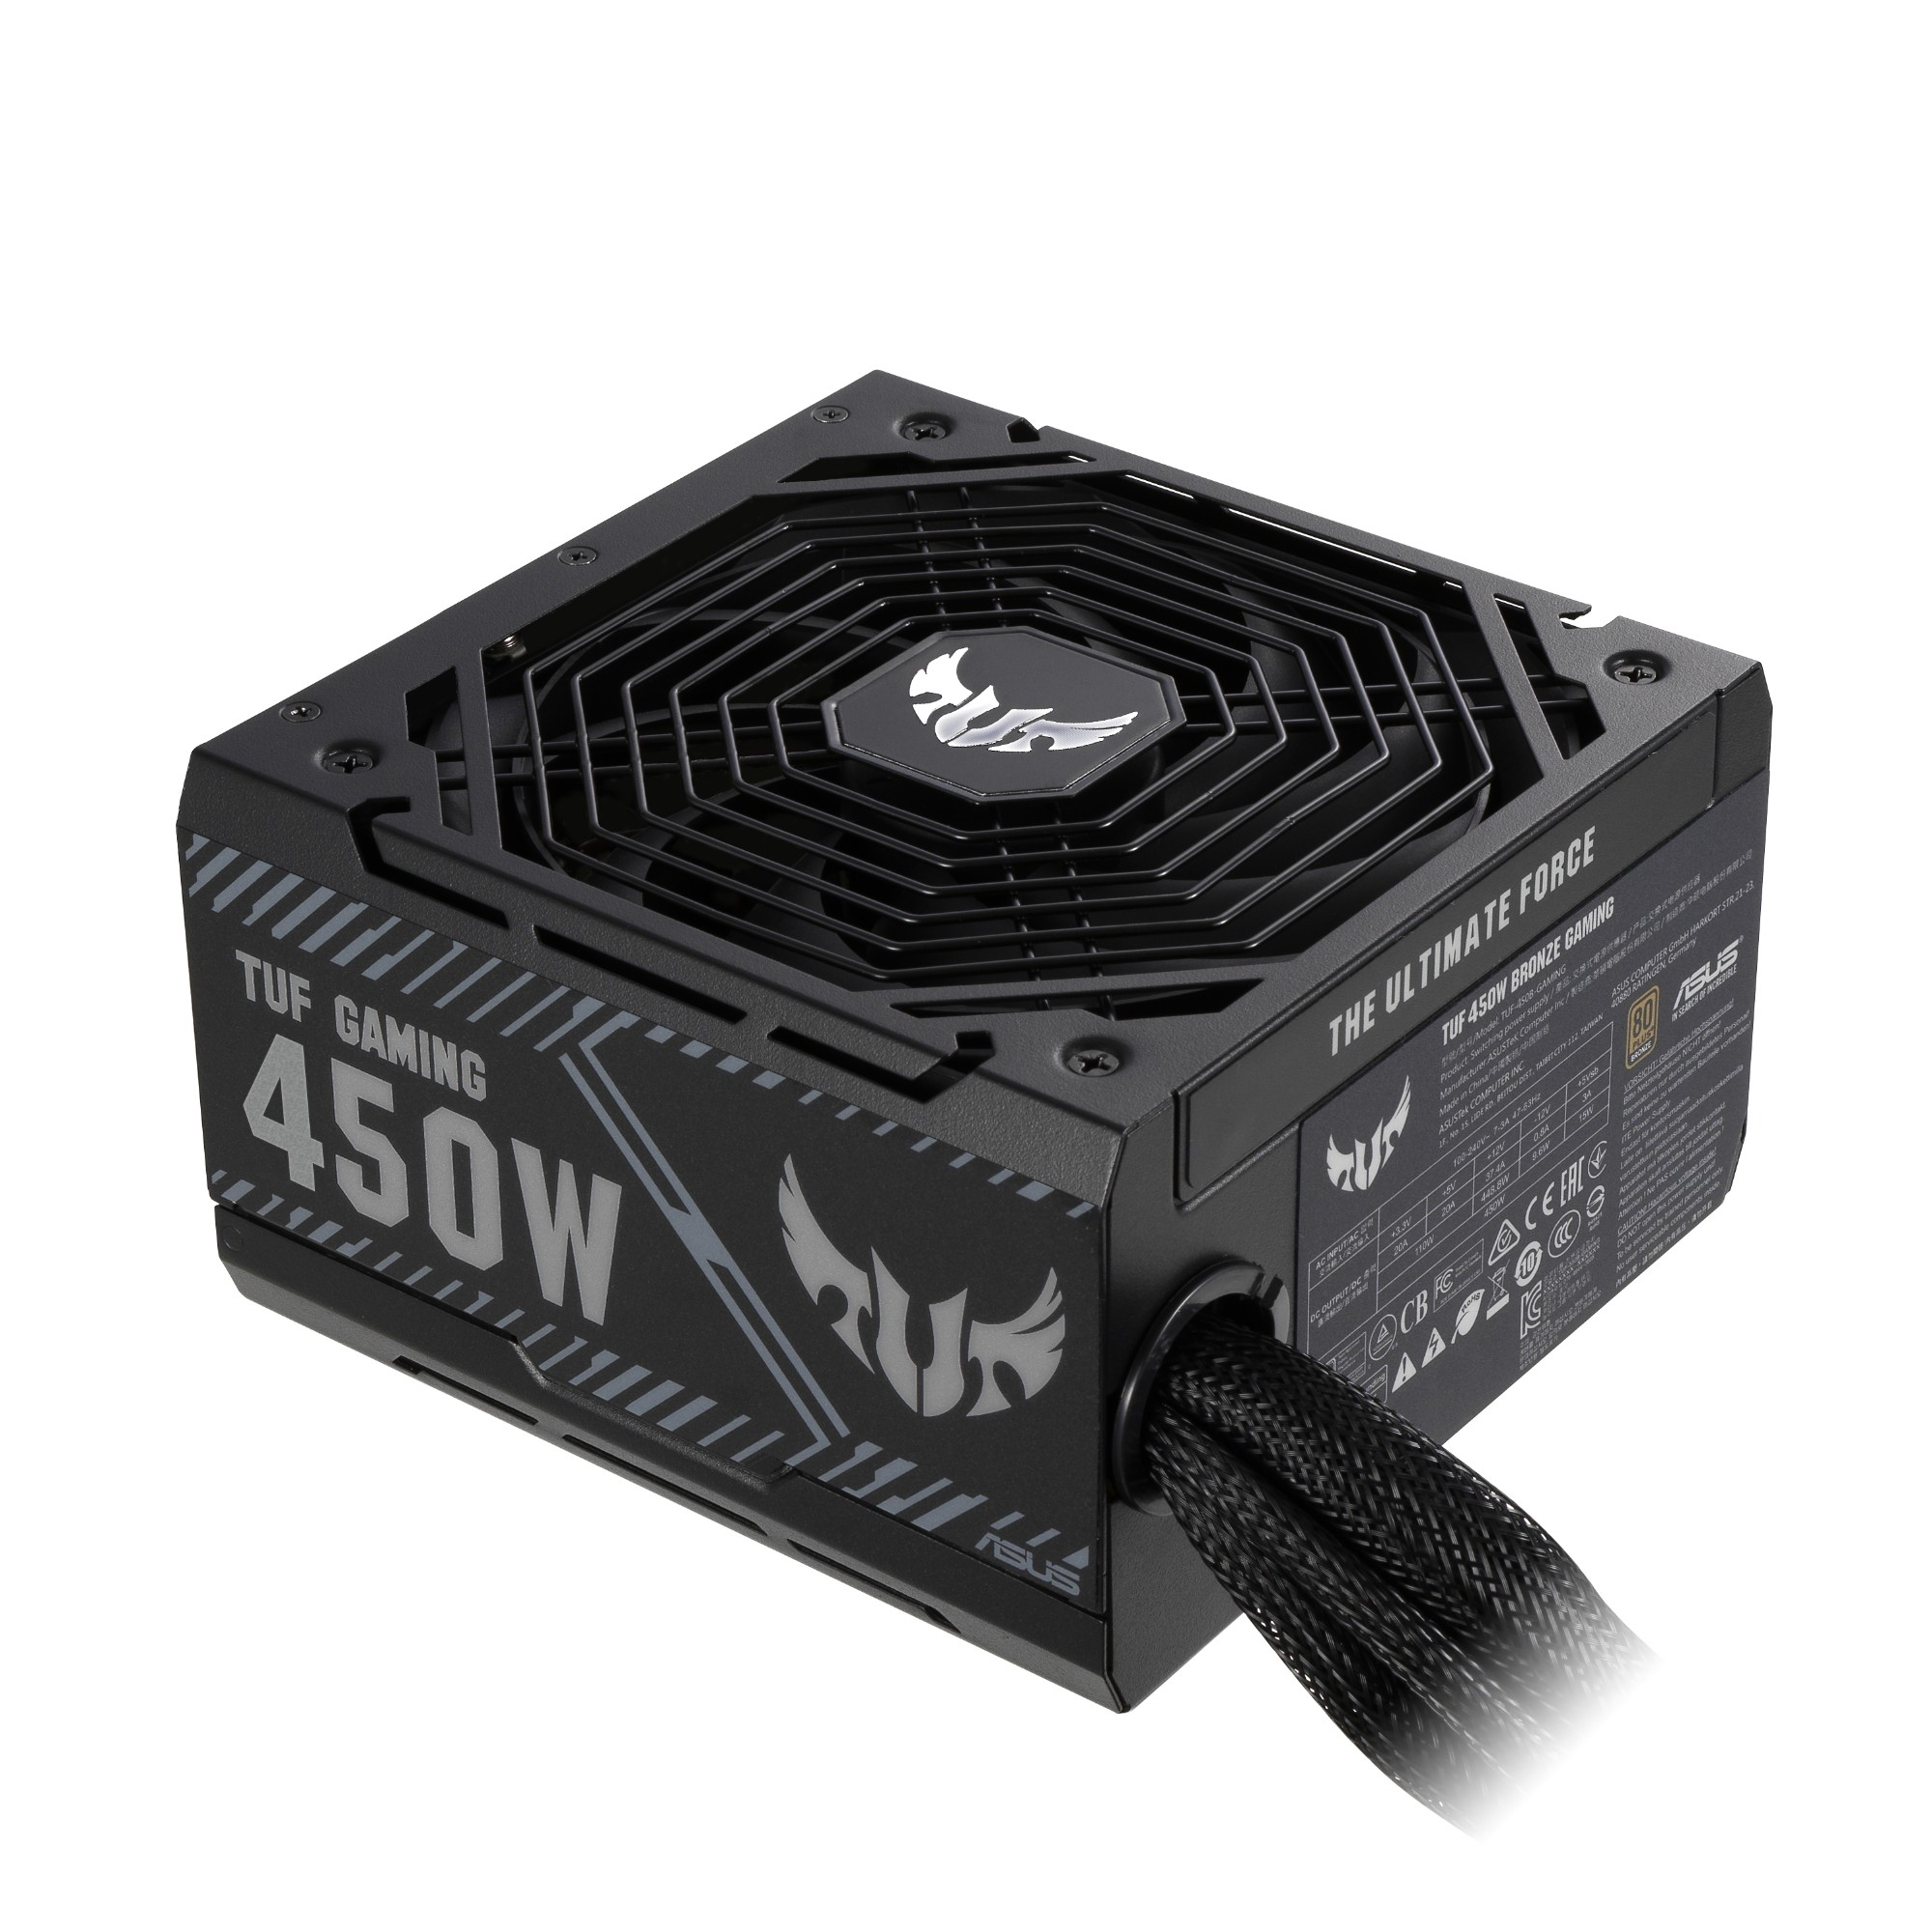 ASUS TUF-GAMING-450B power supply unit 450 W 20+4 pin ATX ATX Black